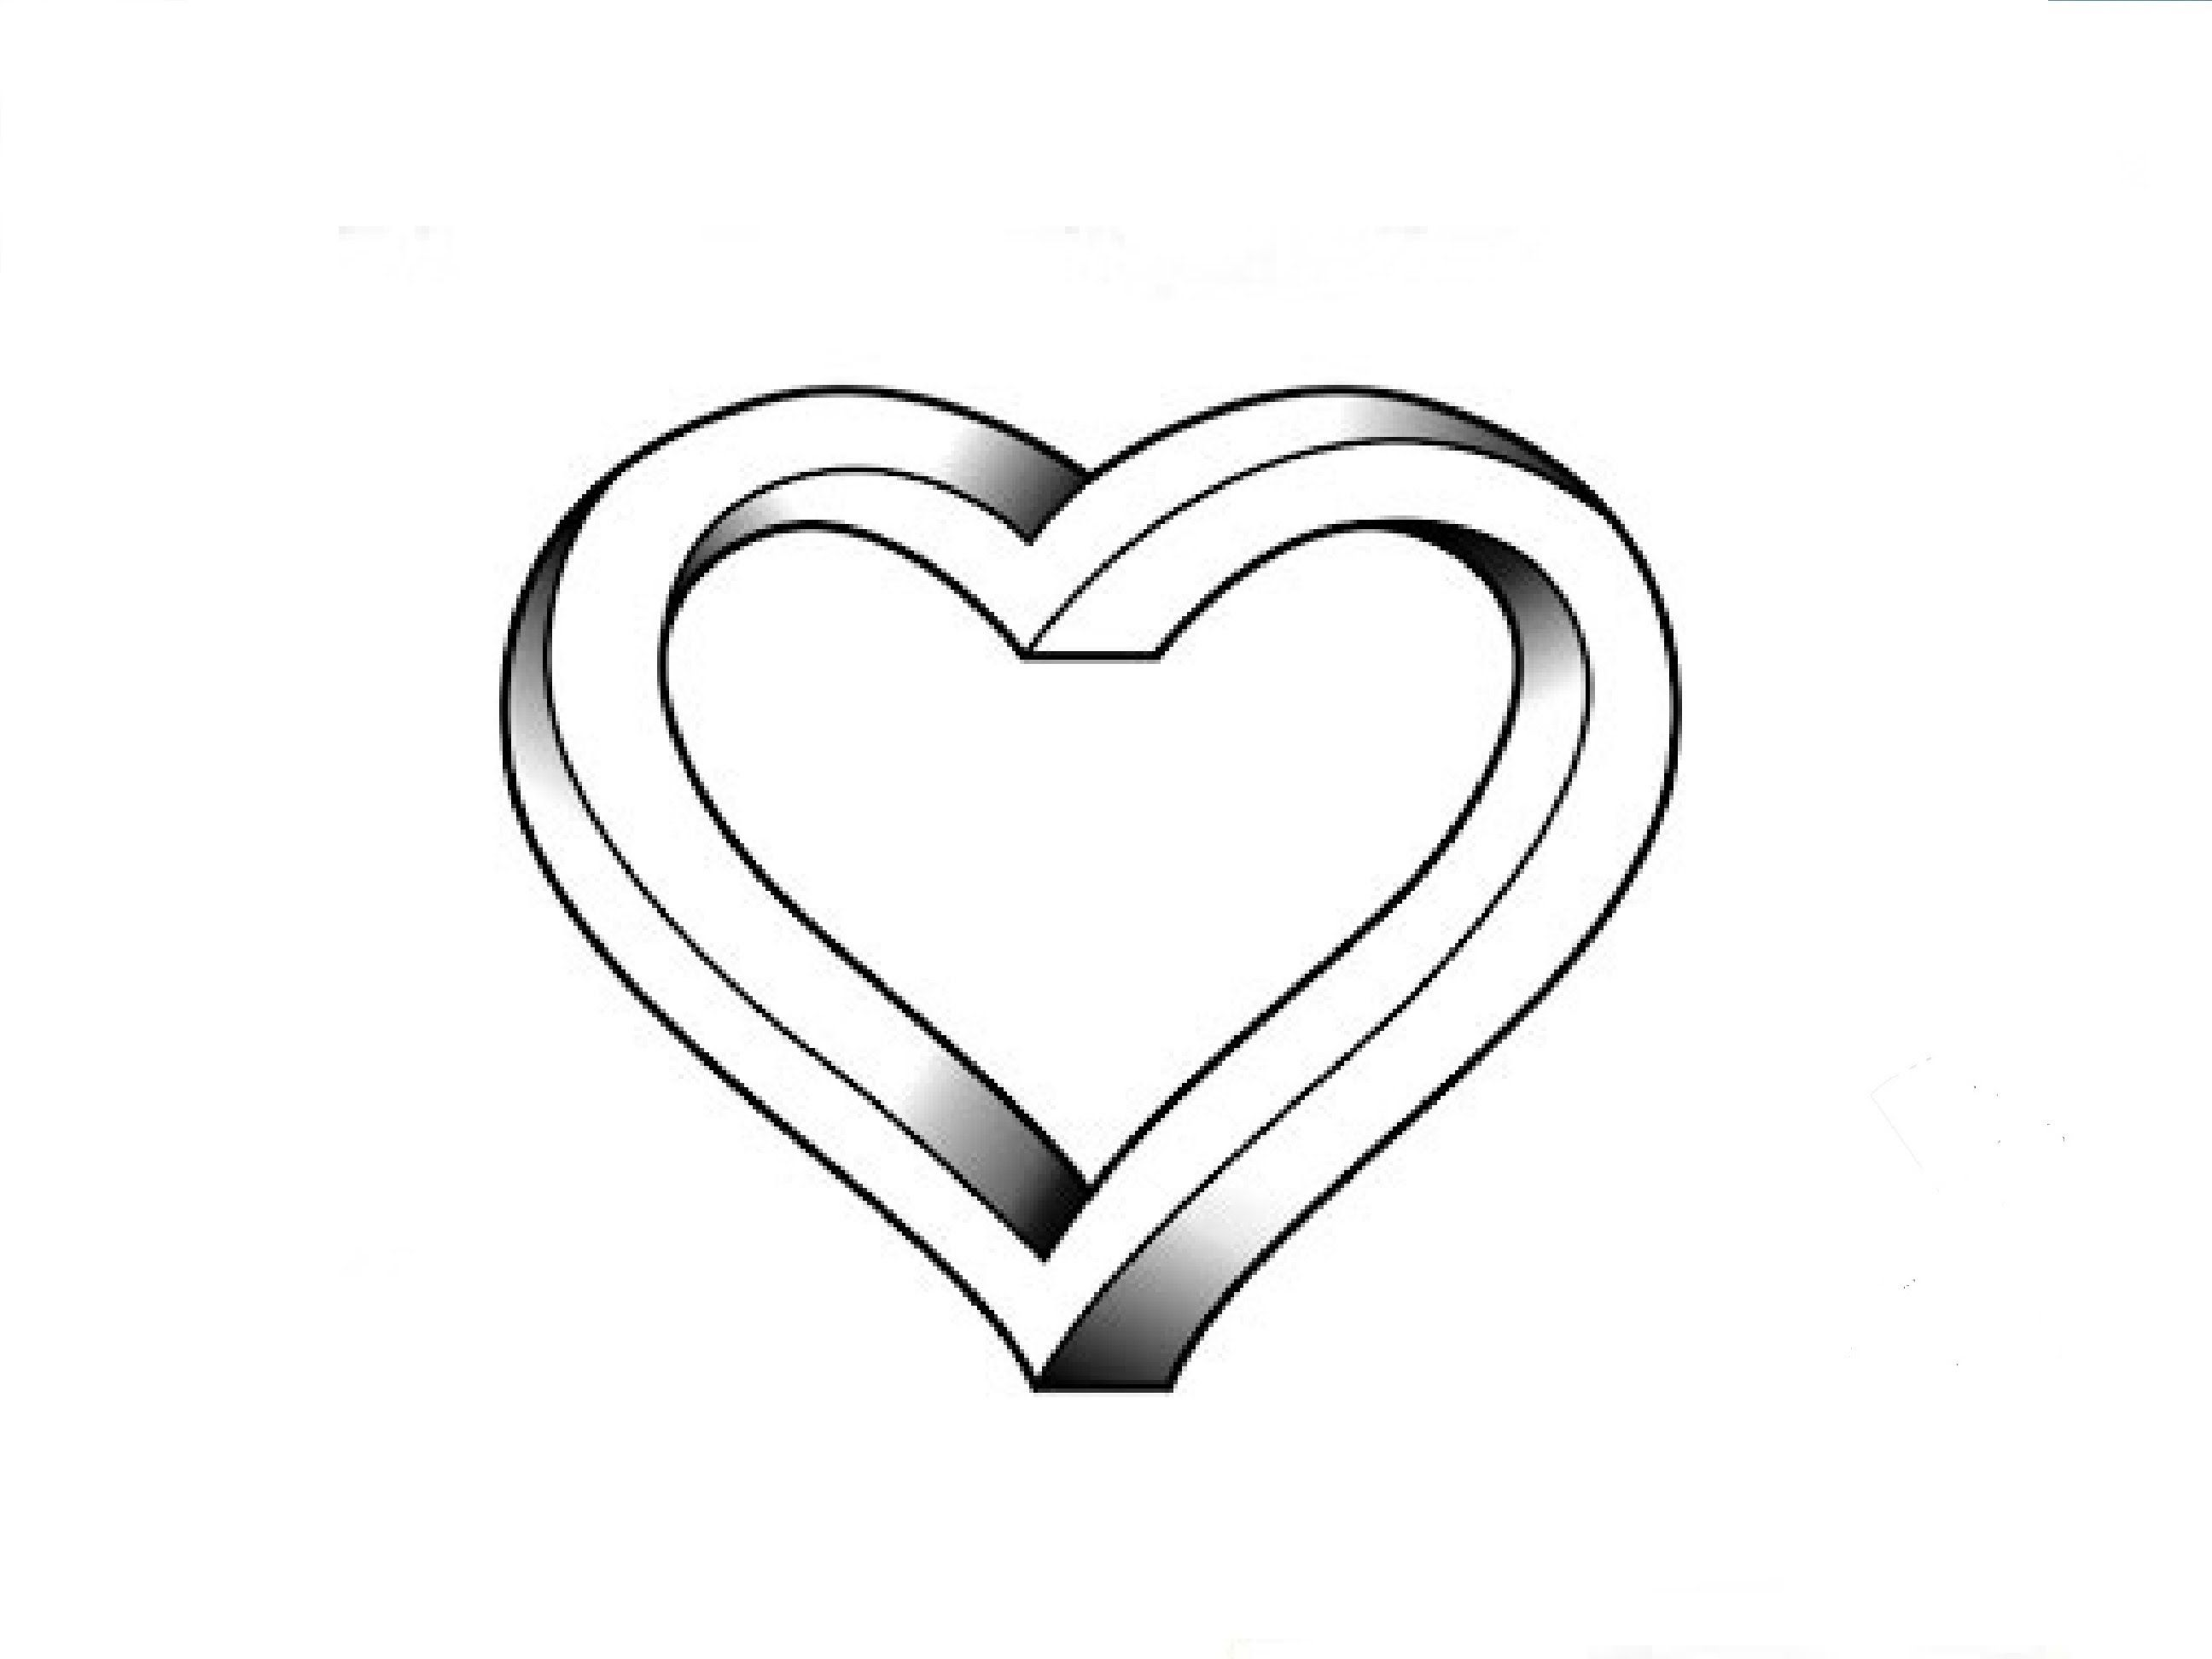 drawings of hearts - HD2592×1944